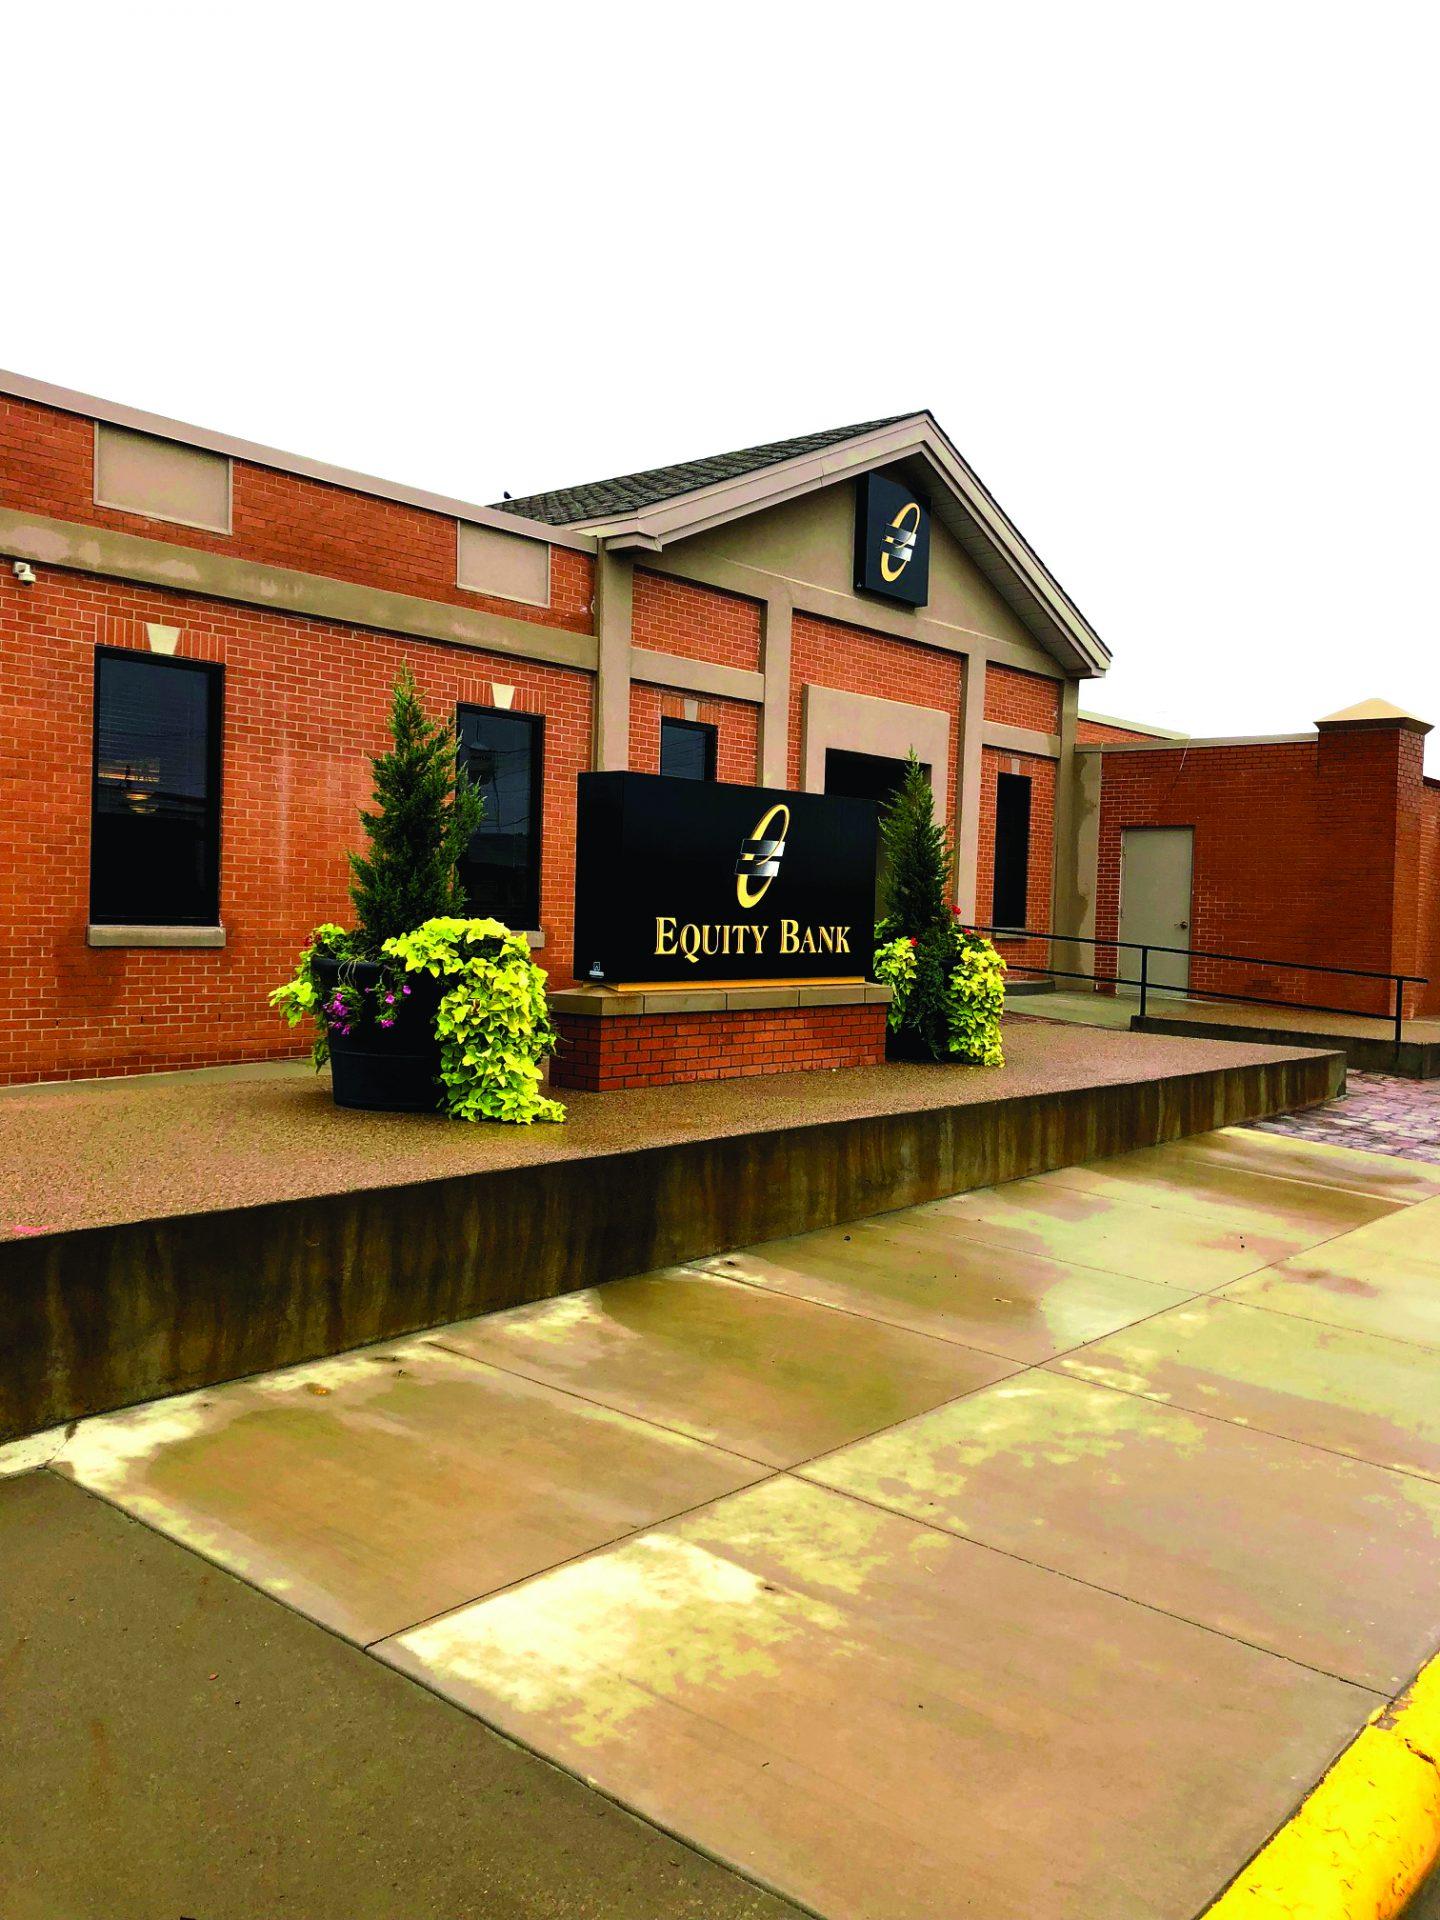 Equity Bank Guymon Main branch exterior.